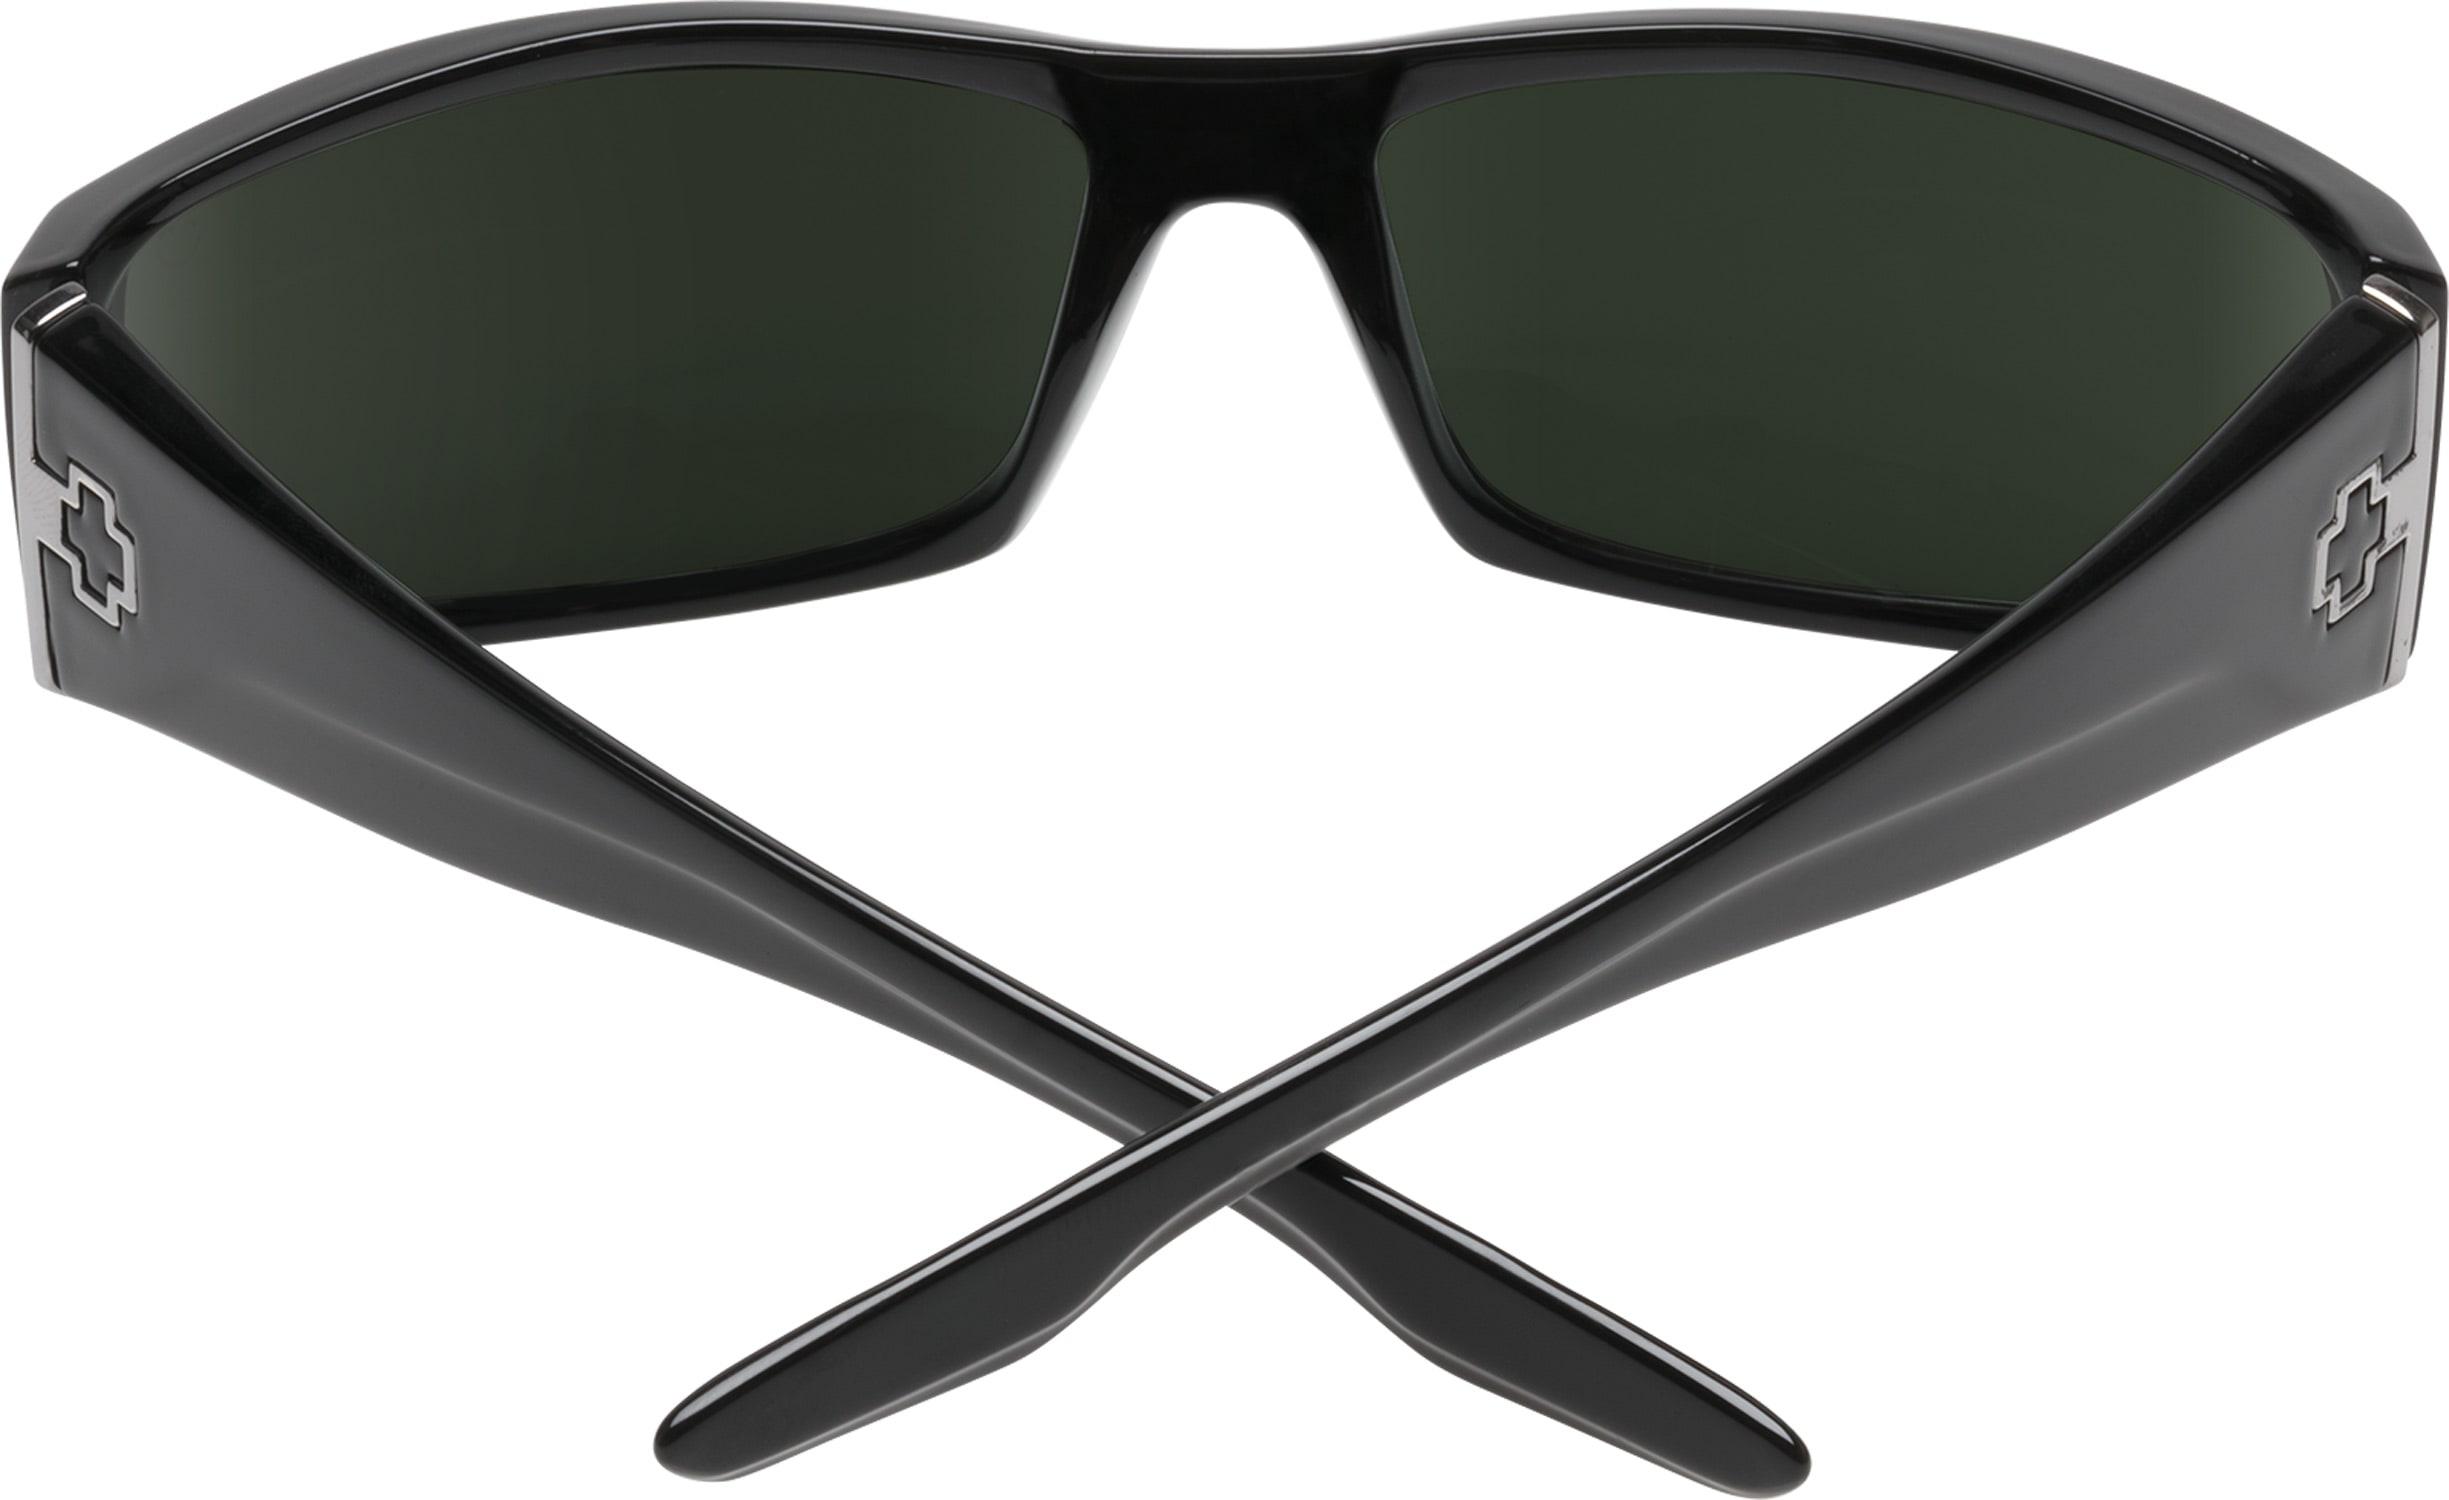 b5beaf924e Spy cooper sunglasses mens ebay jpg 2449x1500 Men spy haymaker